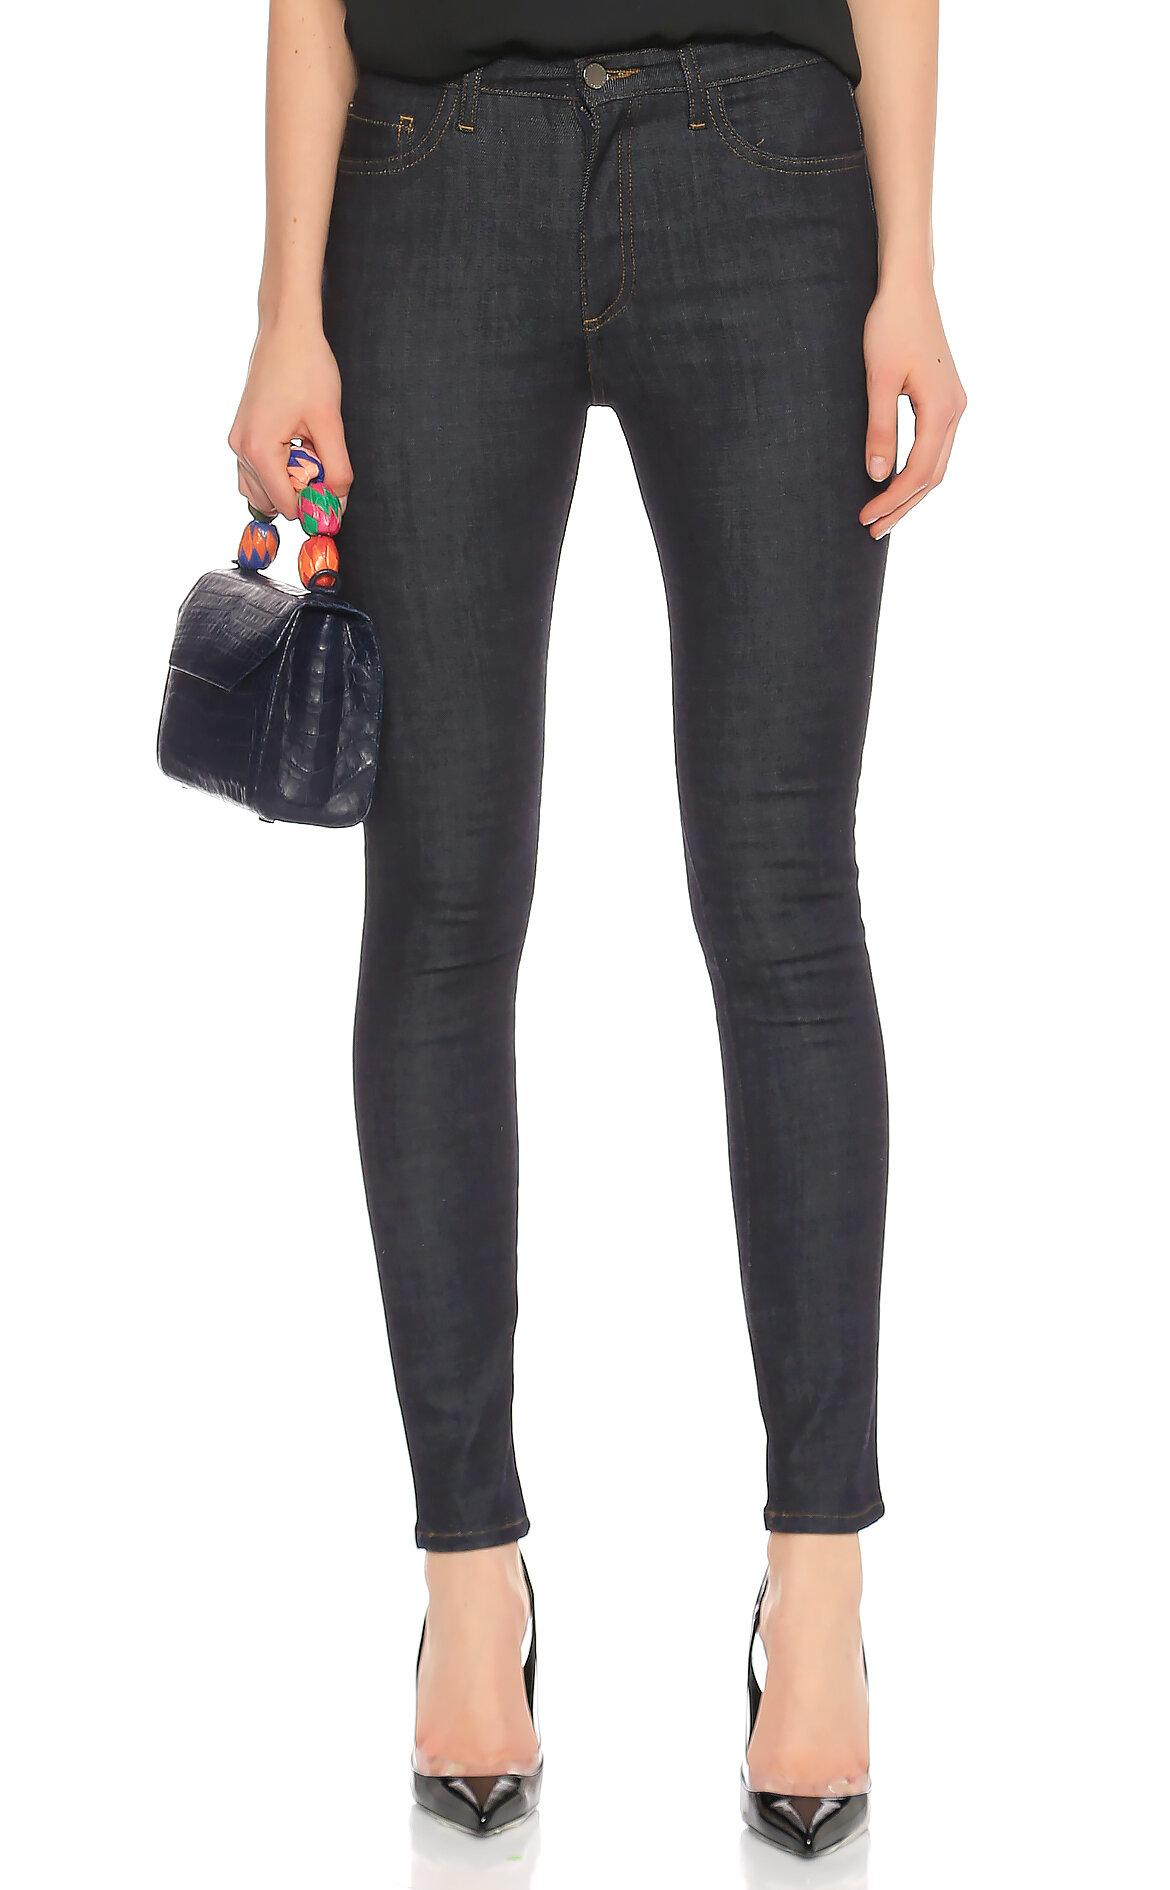 Vvb Skinny Jean Lacivert Pantolon